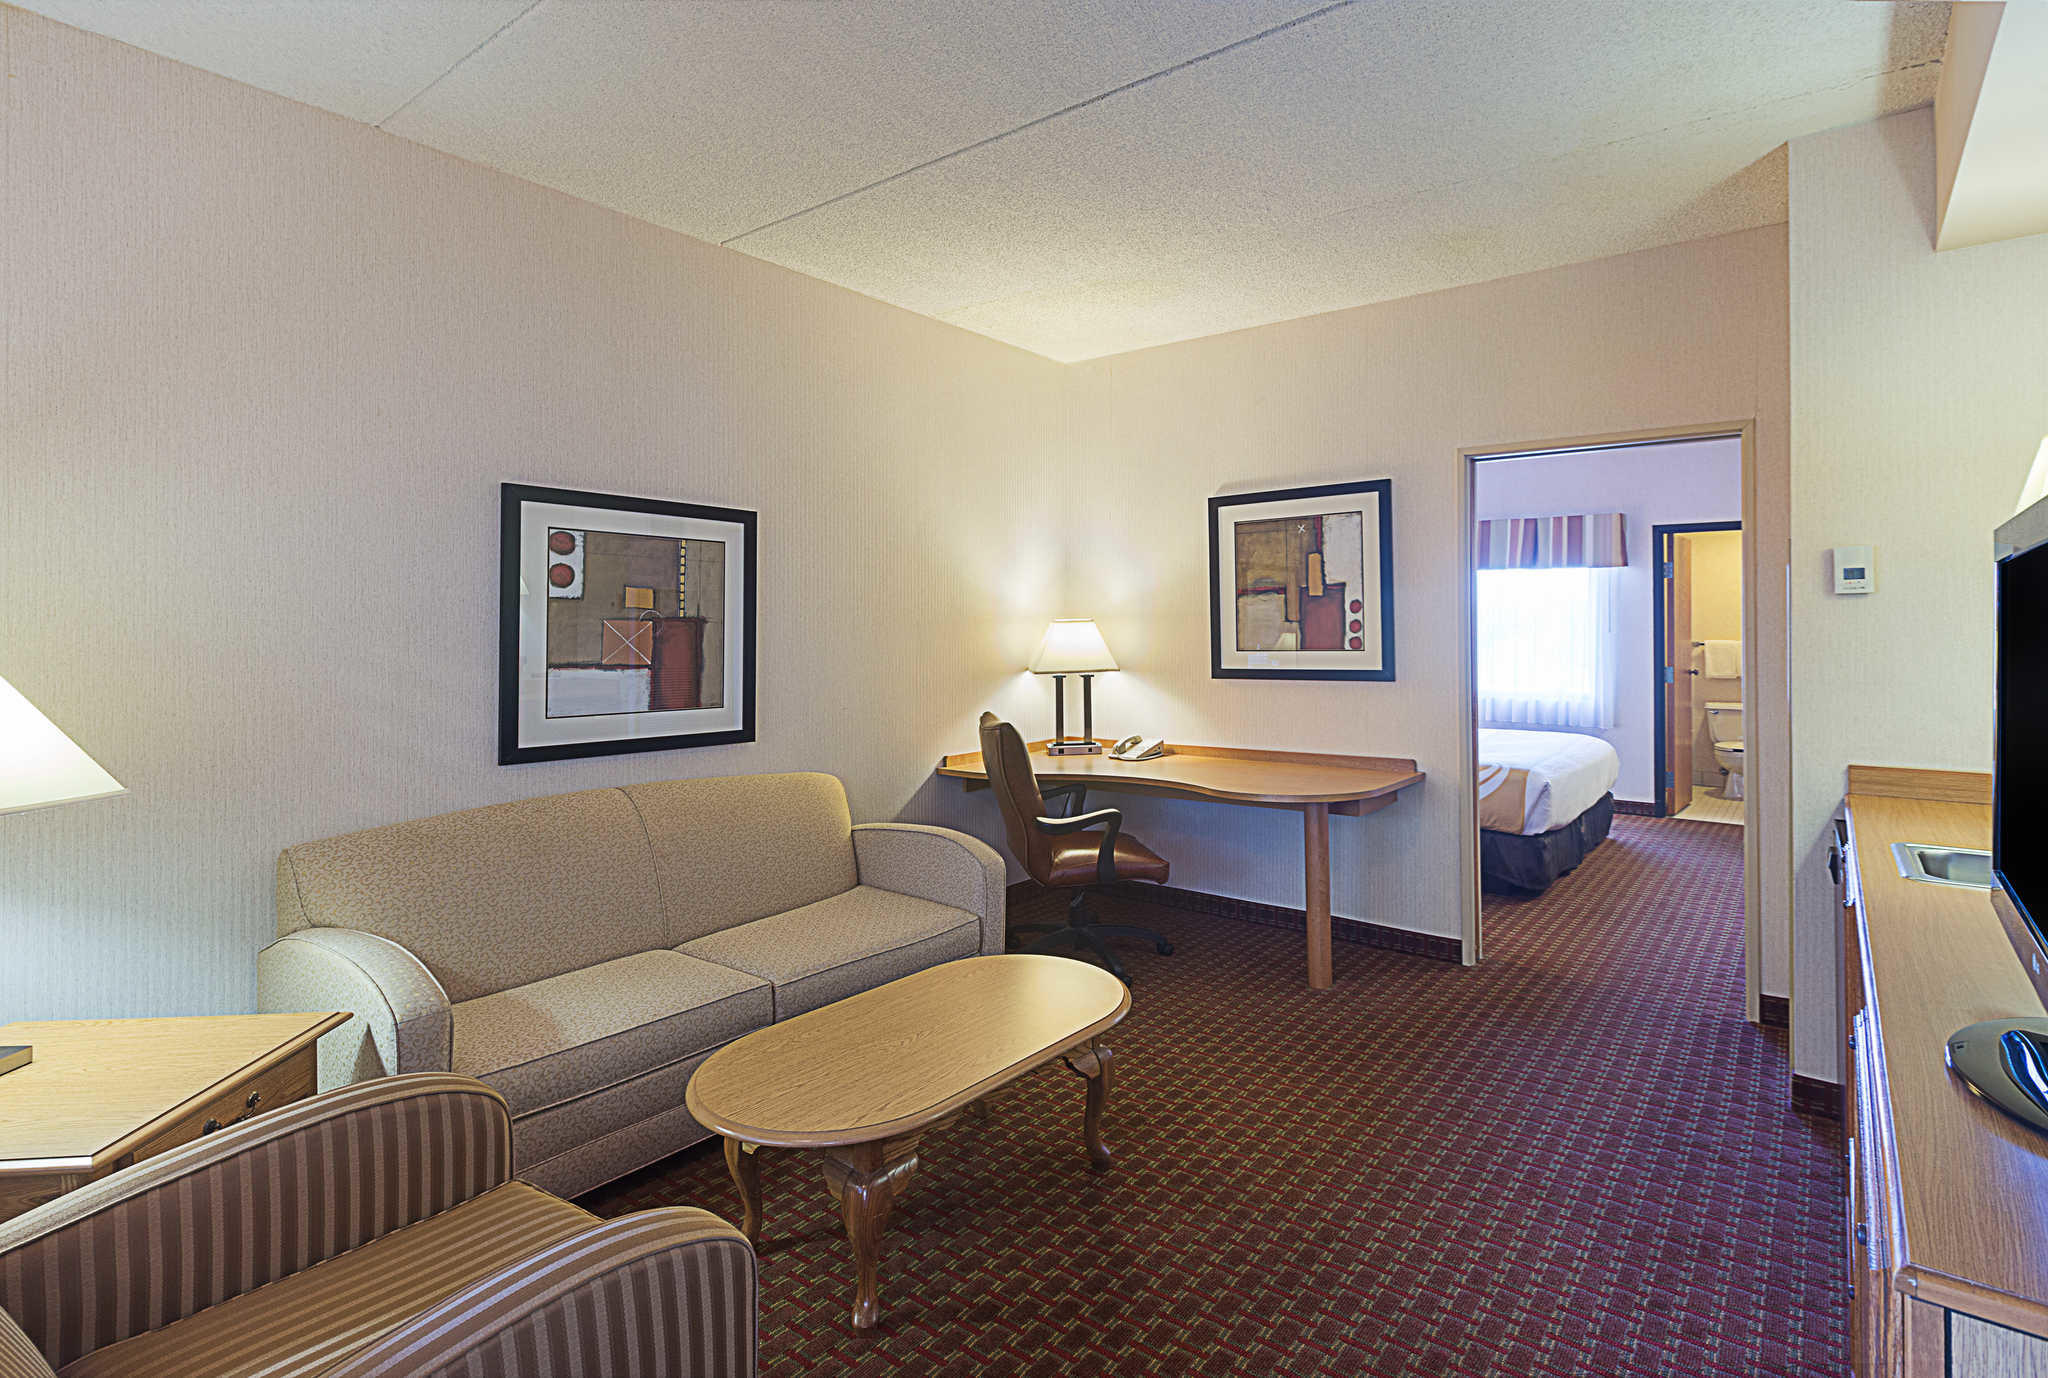 Quality Suites image 17